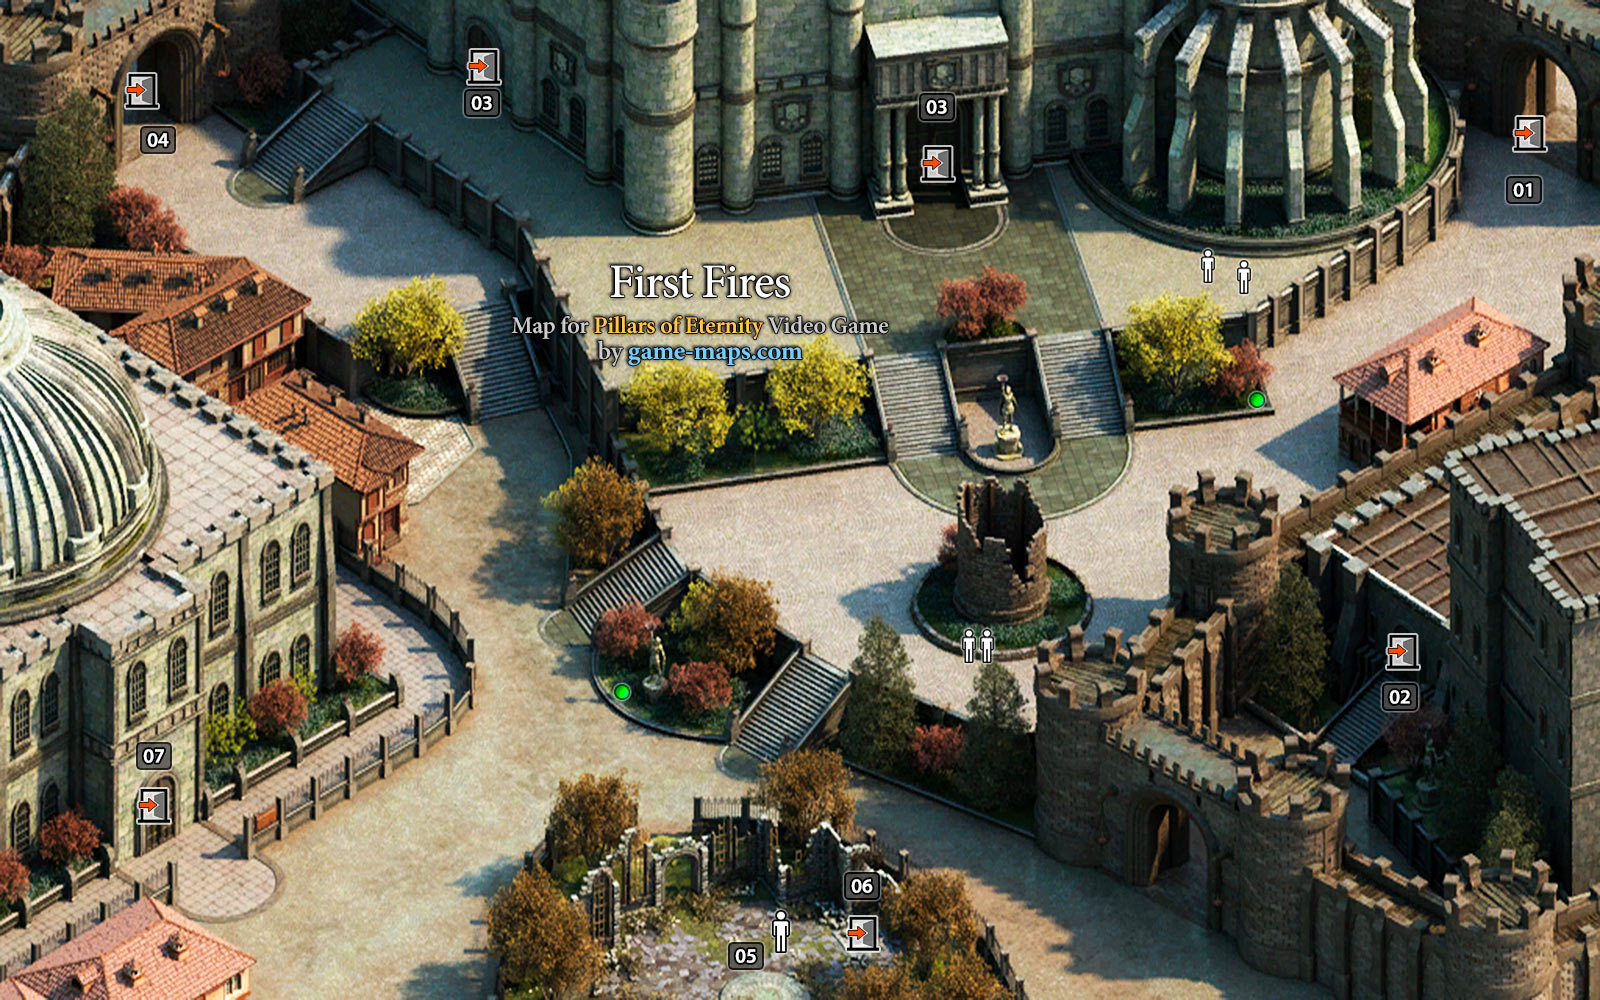 Pillars Of Eternity Karte.First Fires Pillars Of Eternity Game Maps Com